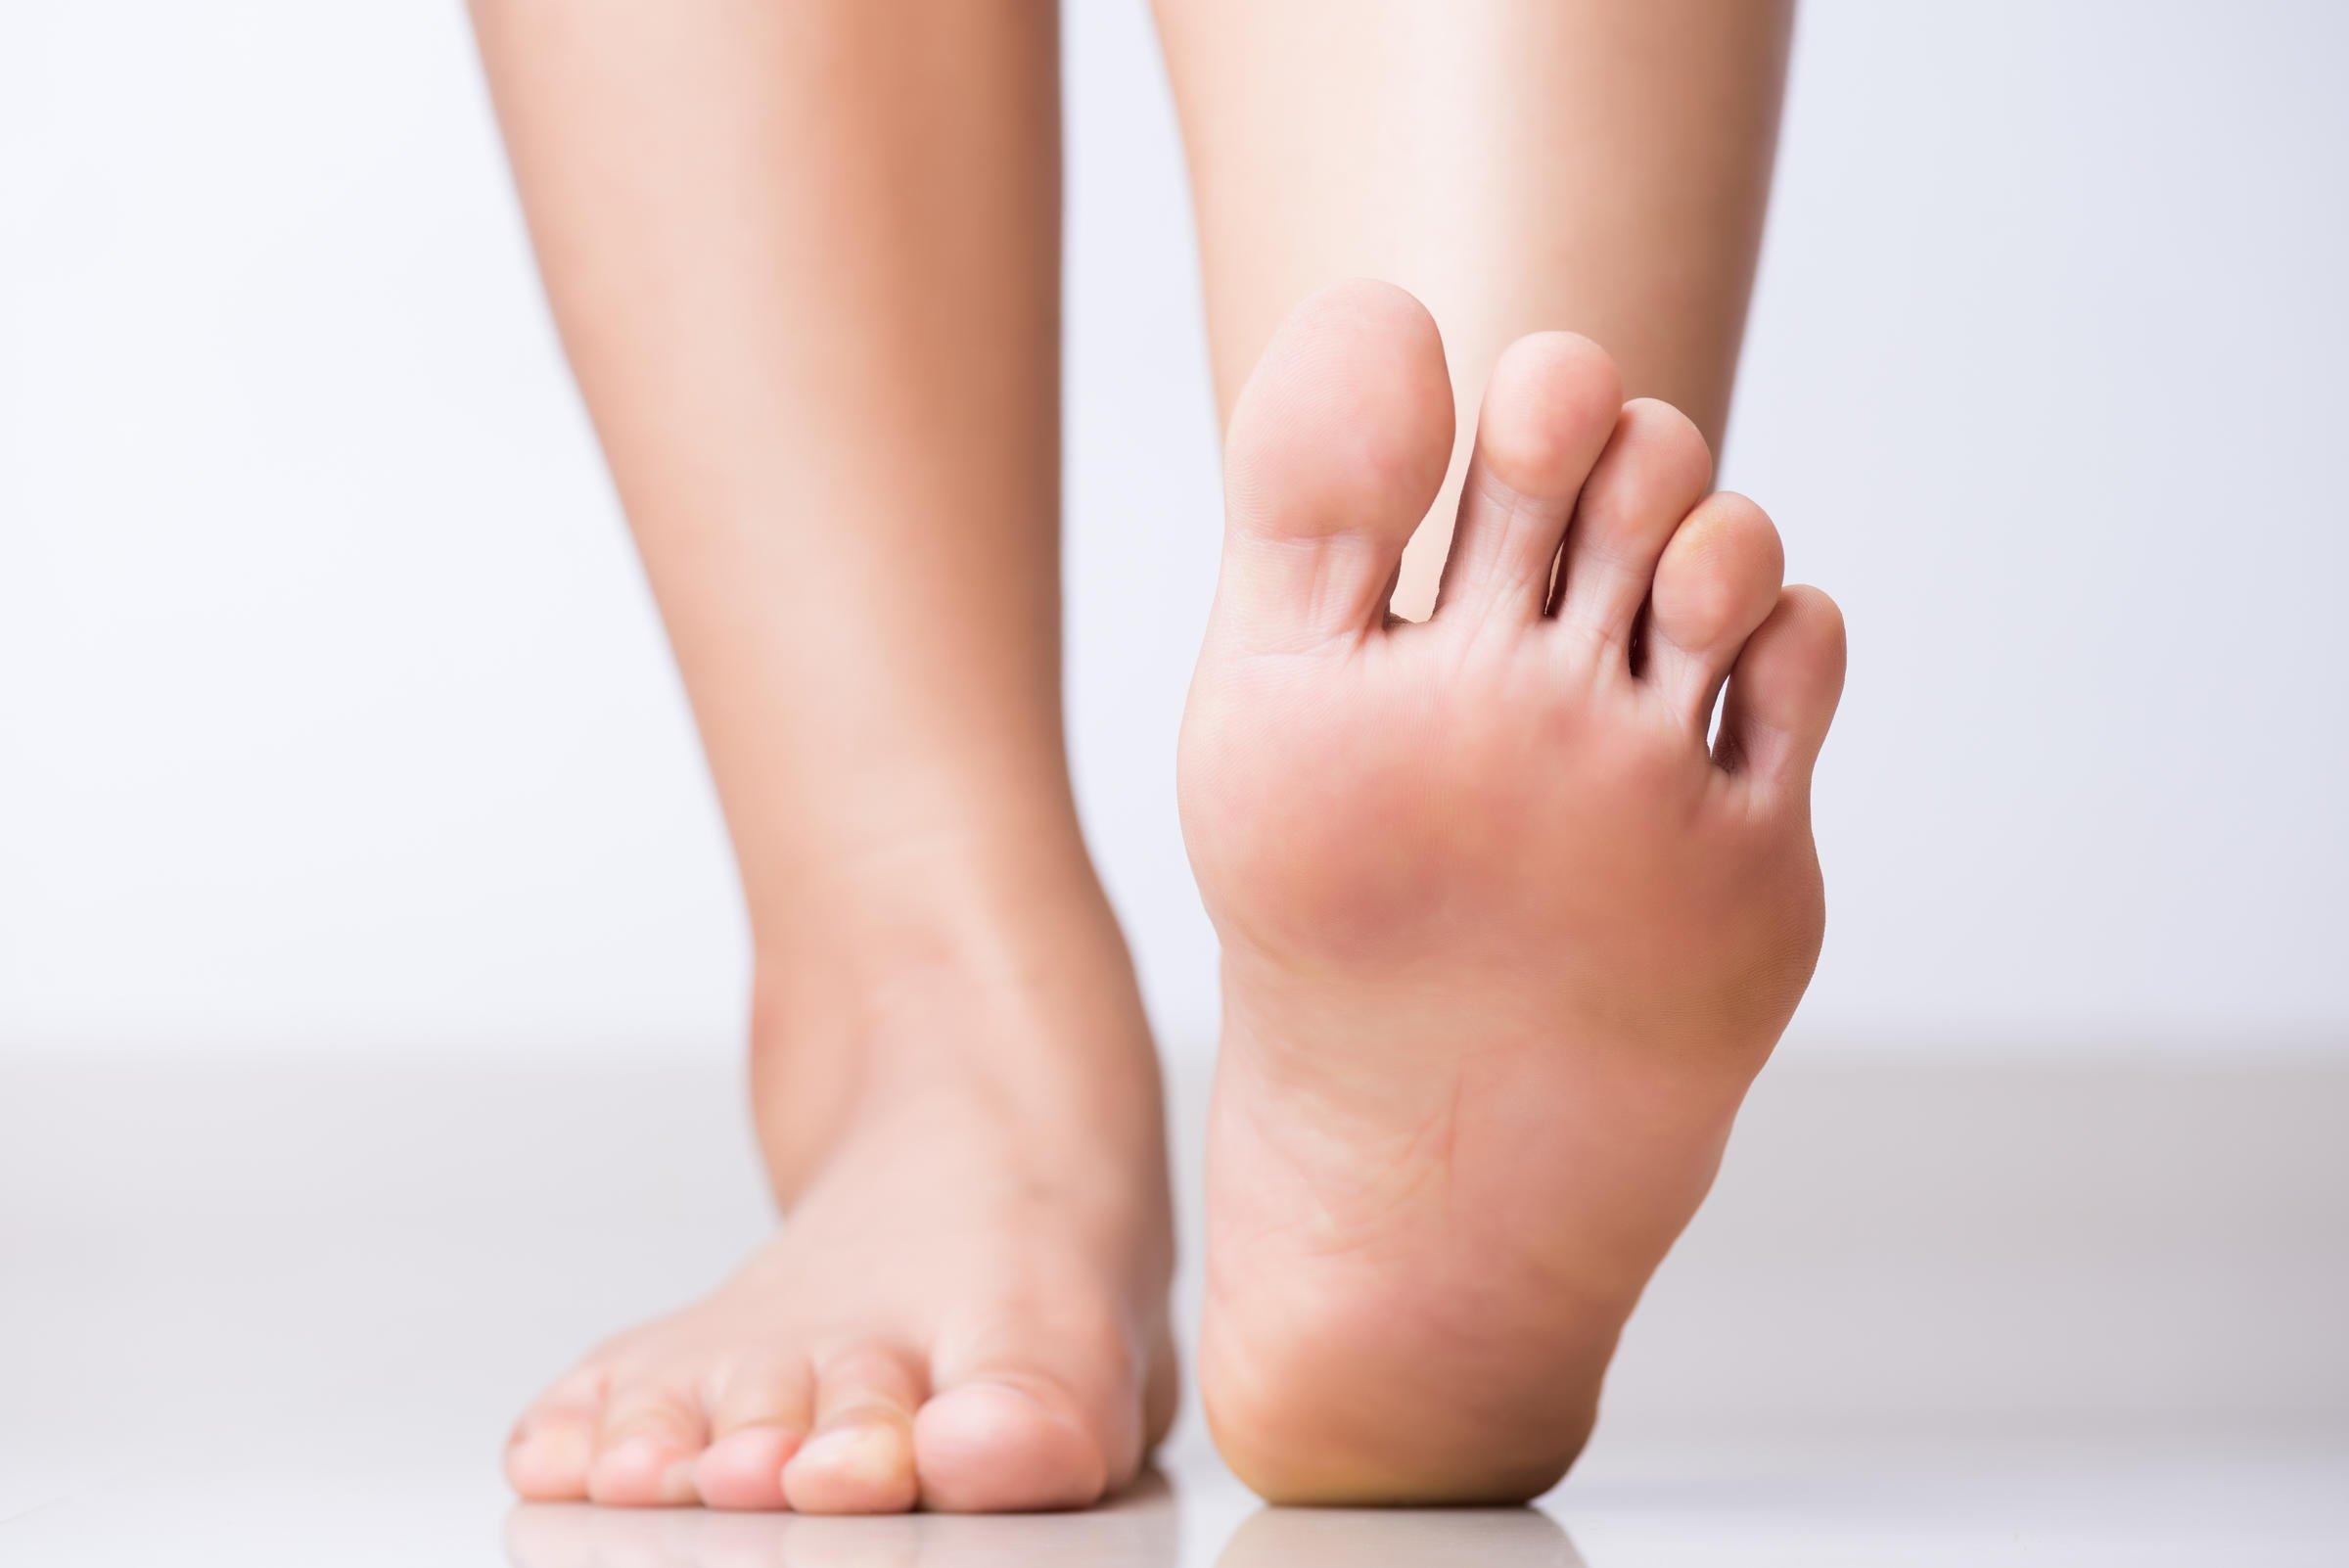 toenails falling off